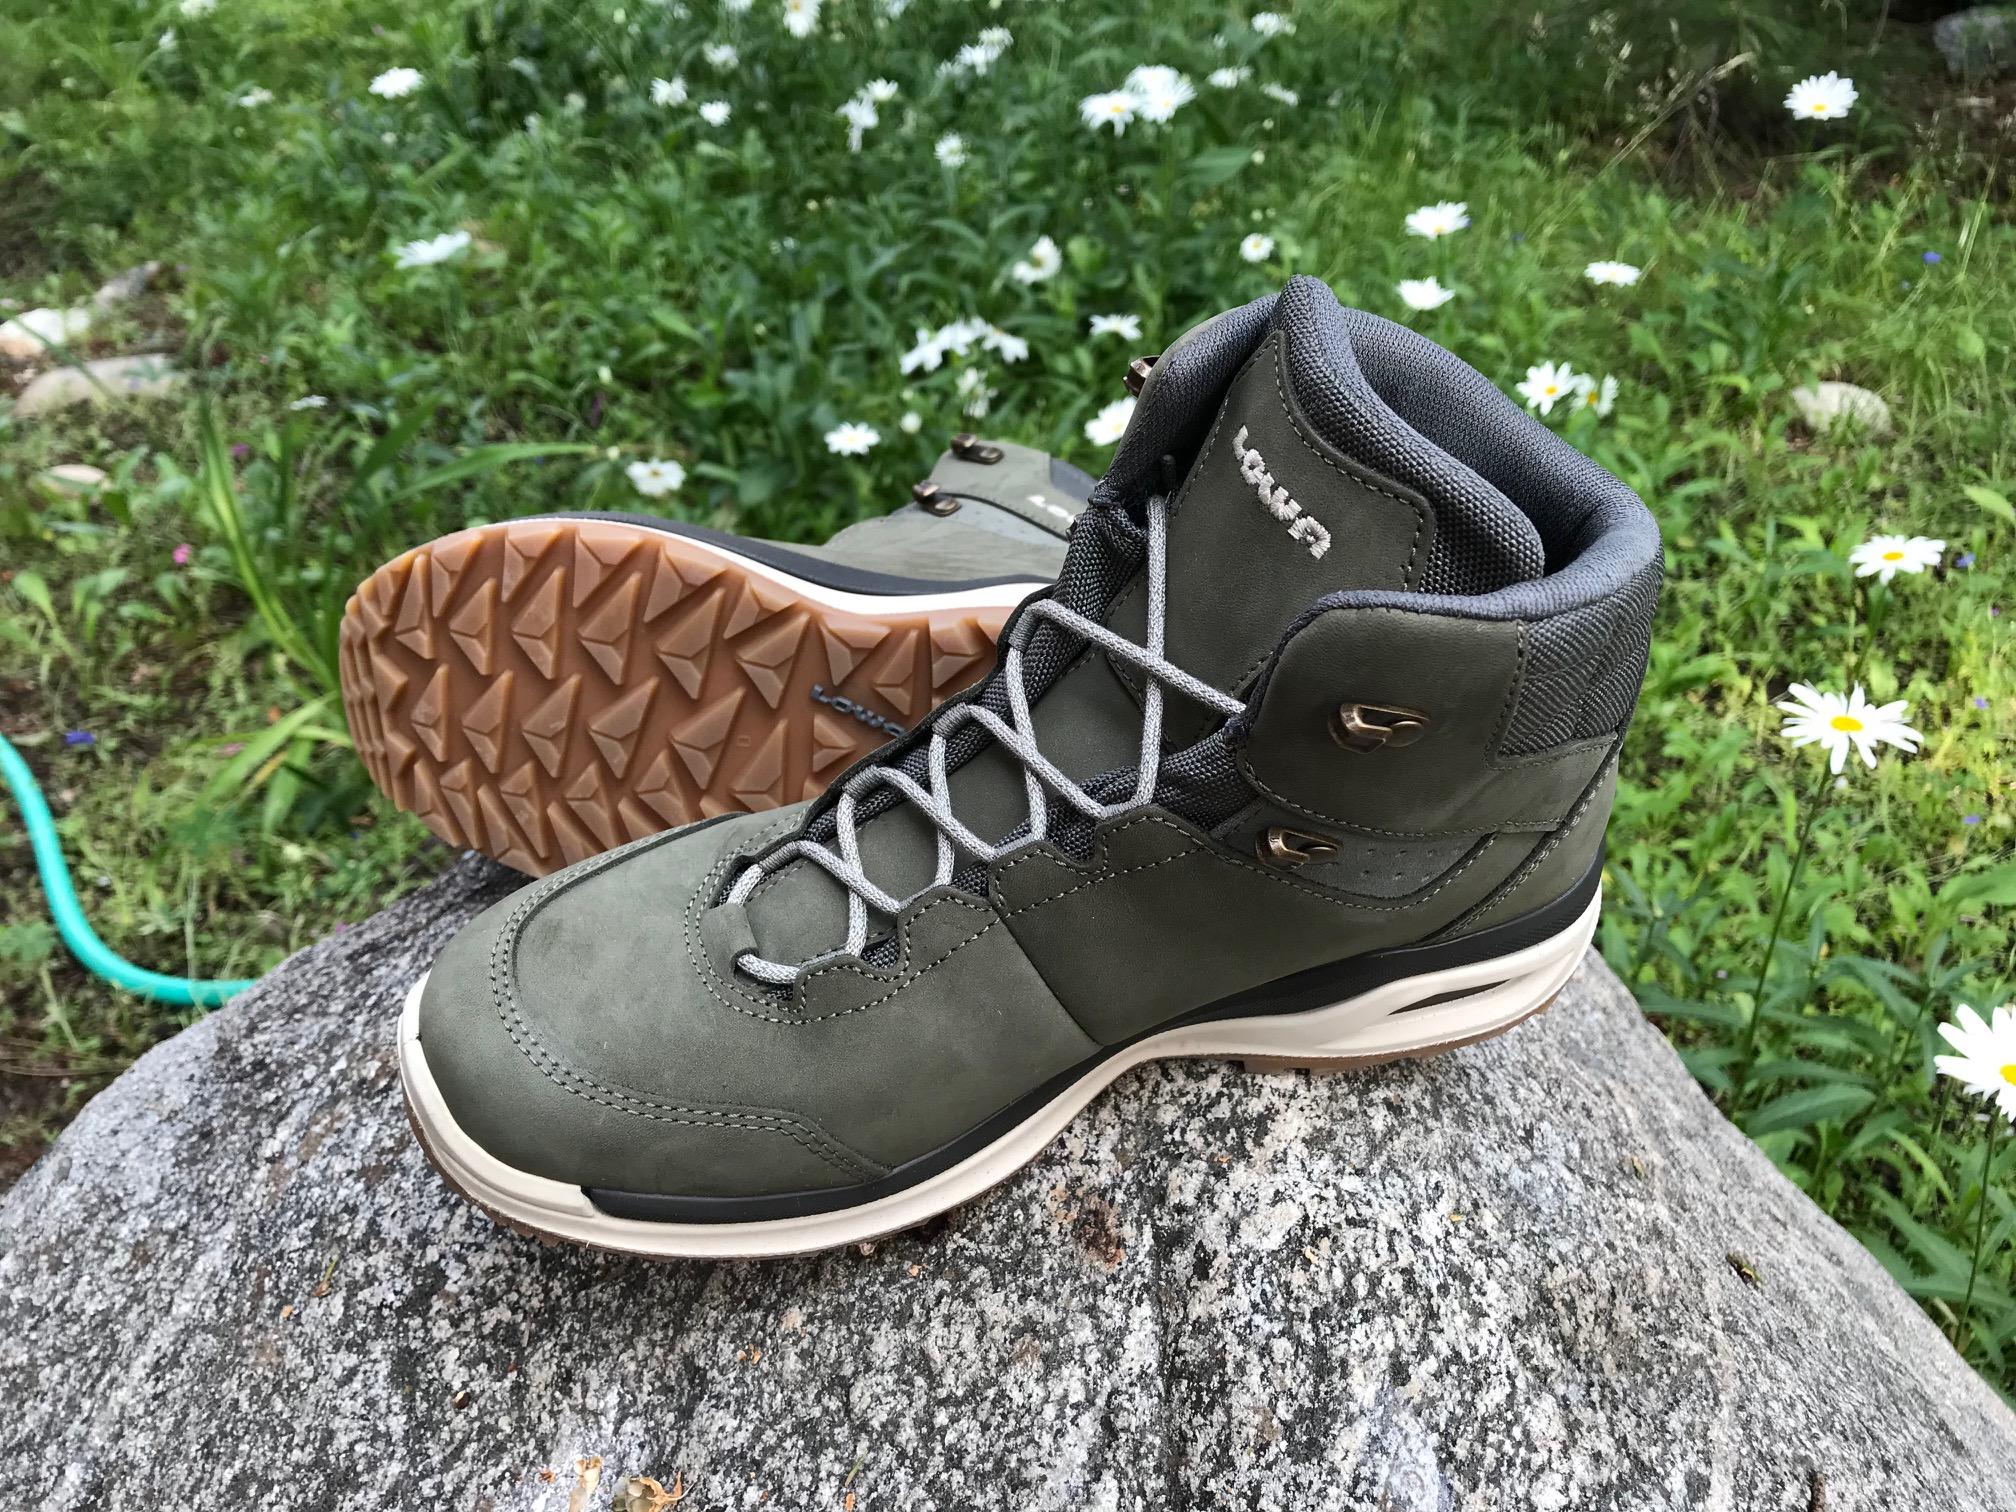 Lowa Locarno GTX® - A Lightweight Boot